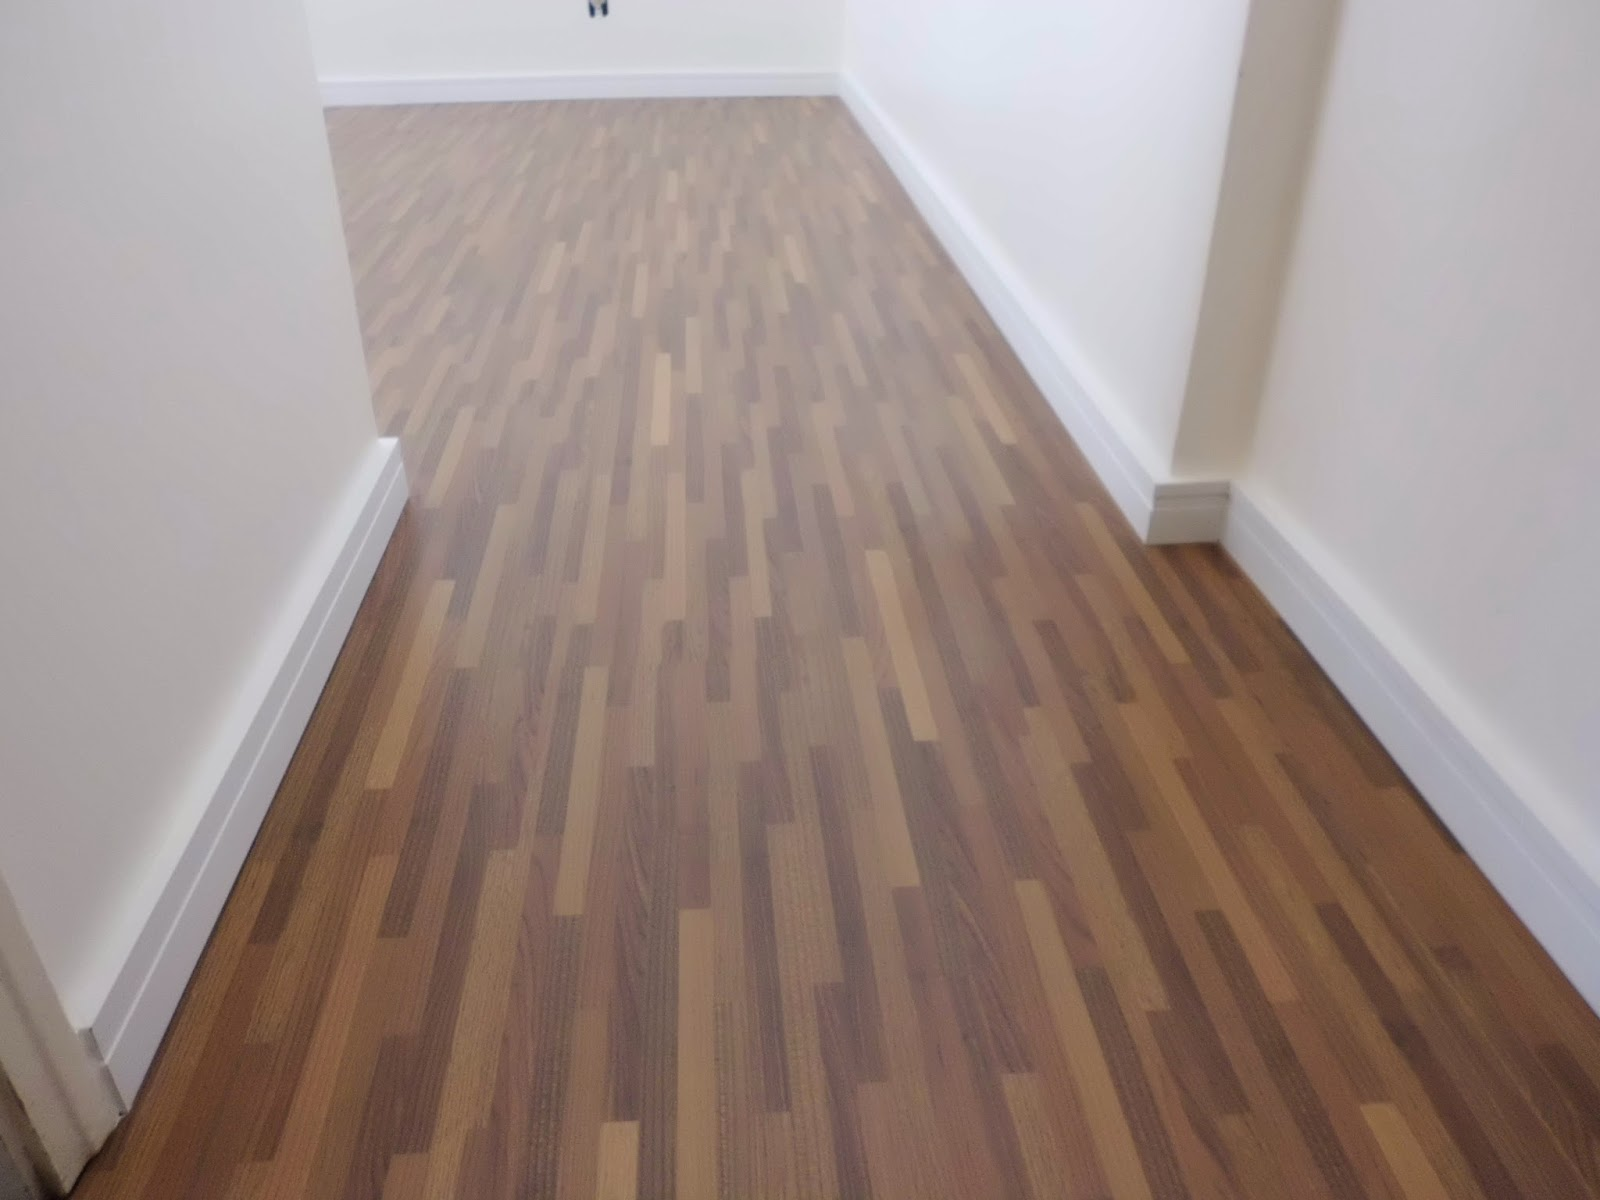 Pisos de madeira piso laminado cumaru palito instalado for Piso laminado instalado